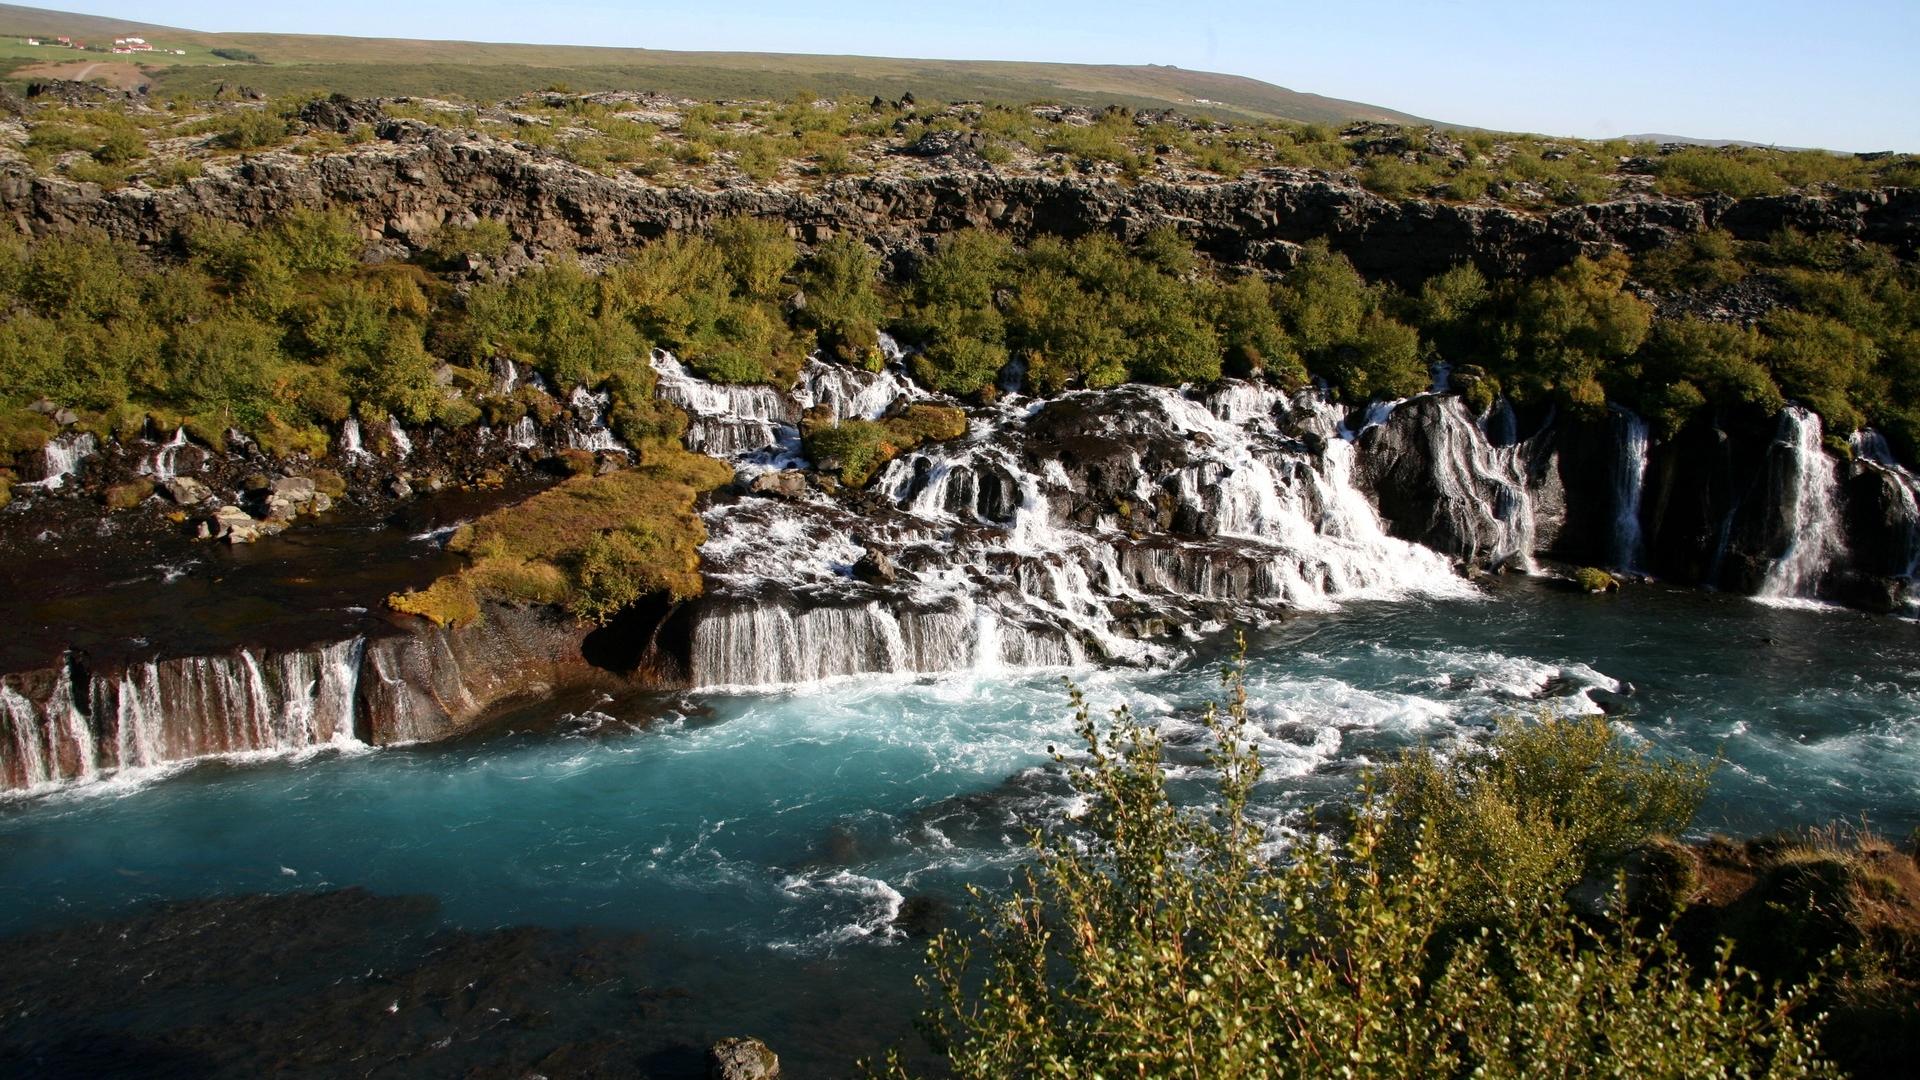 обои горы, камни, водопады, течение картинки фото